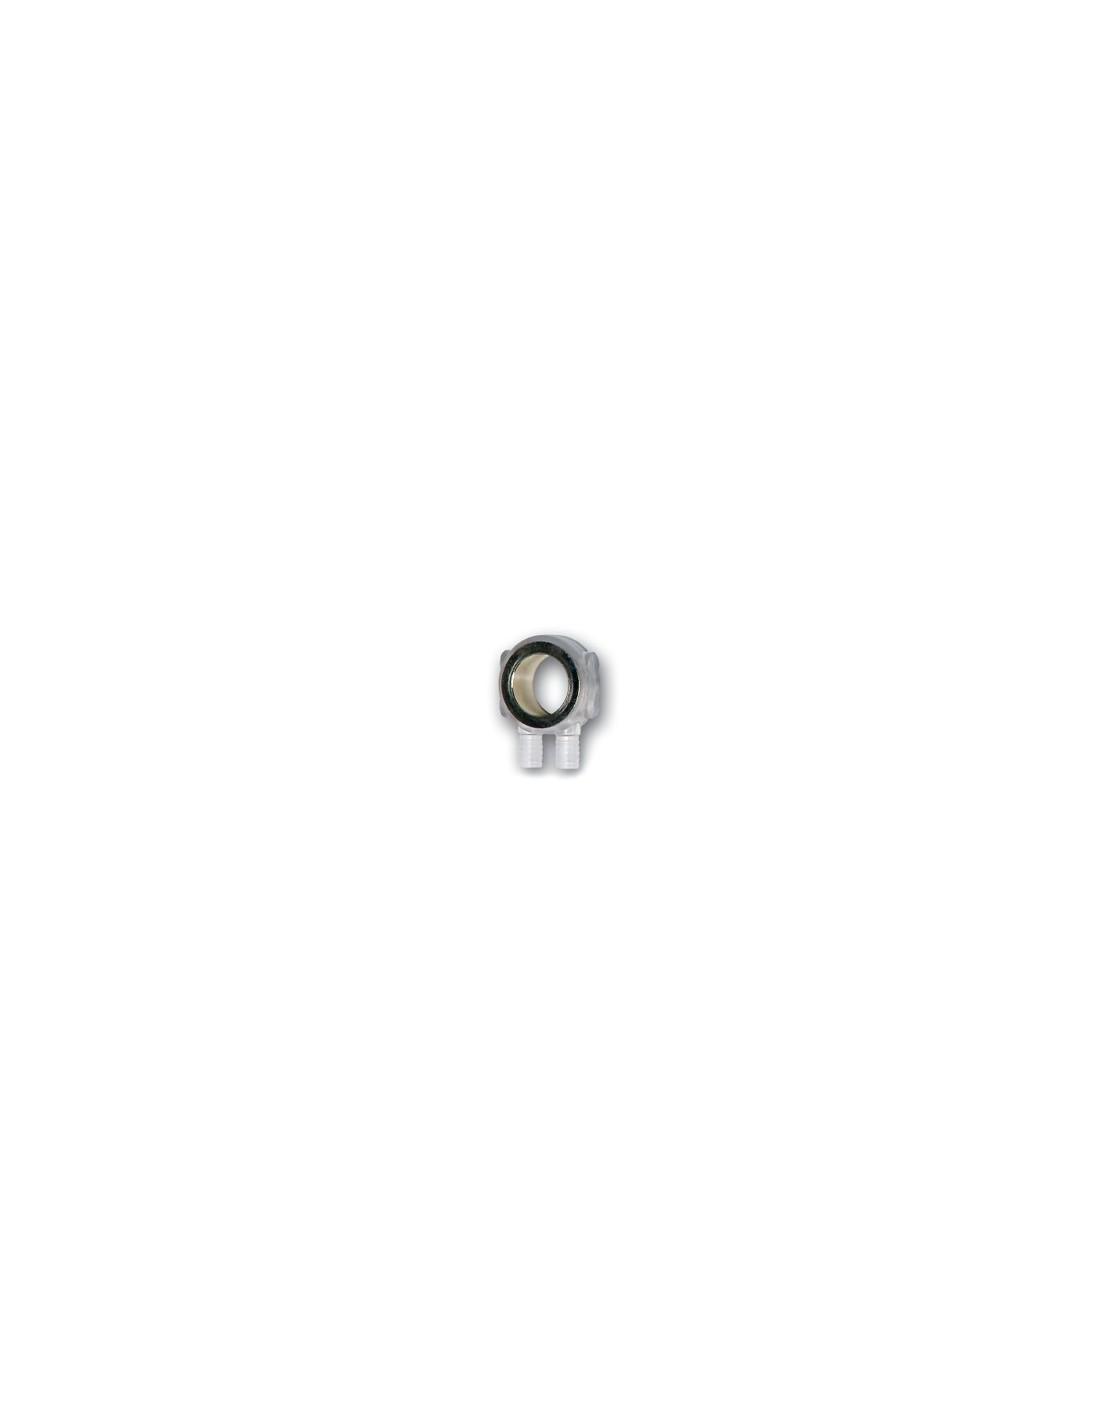 UPP00099 - Tappskruv 55mm (15)